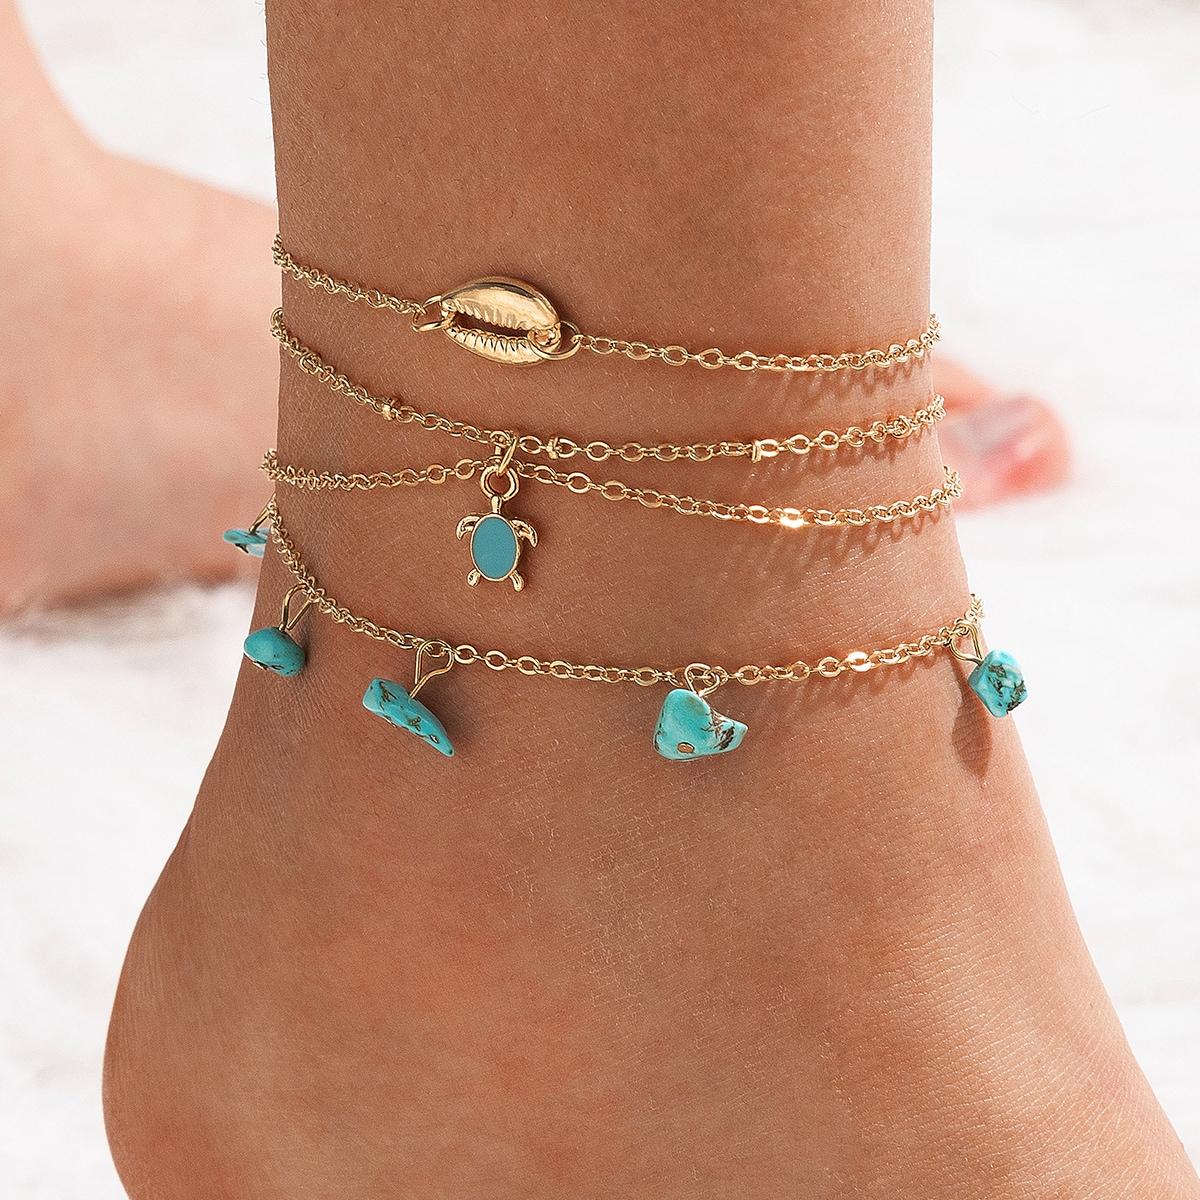 3pcs Turquoise & Shell Decor Anklet